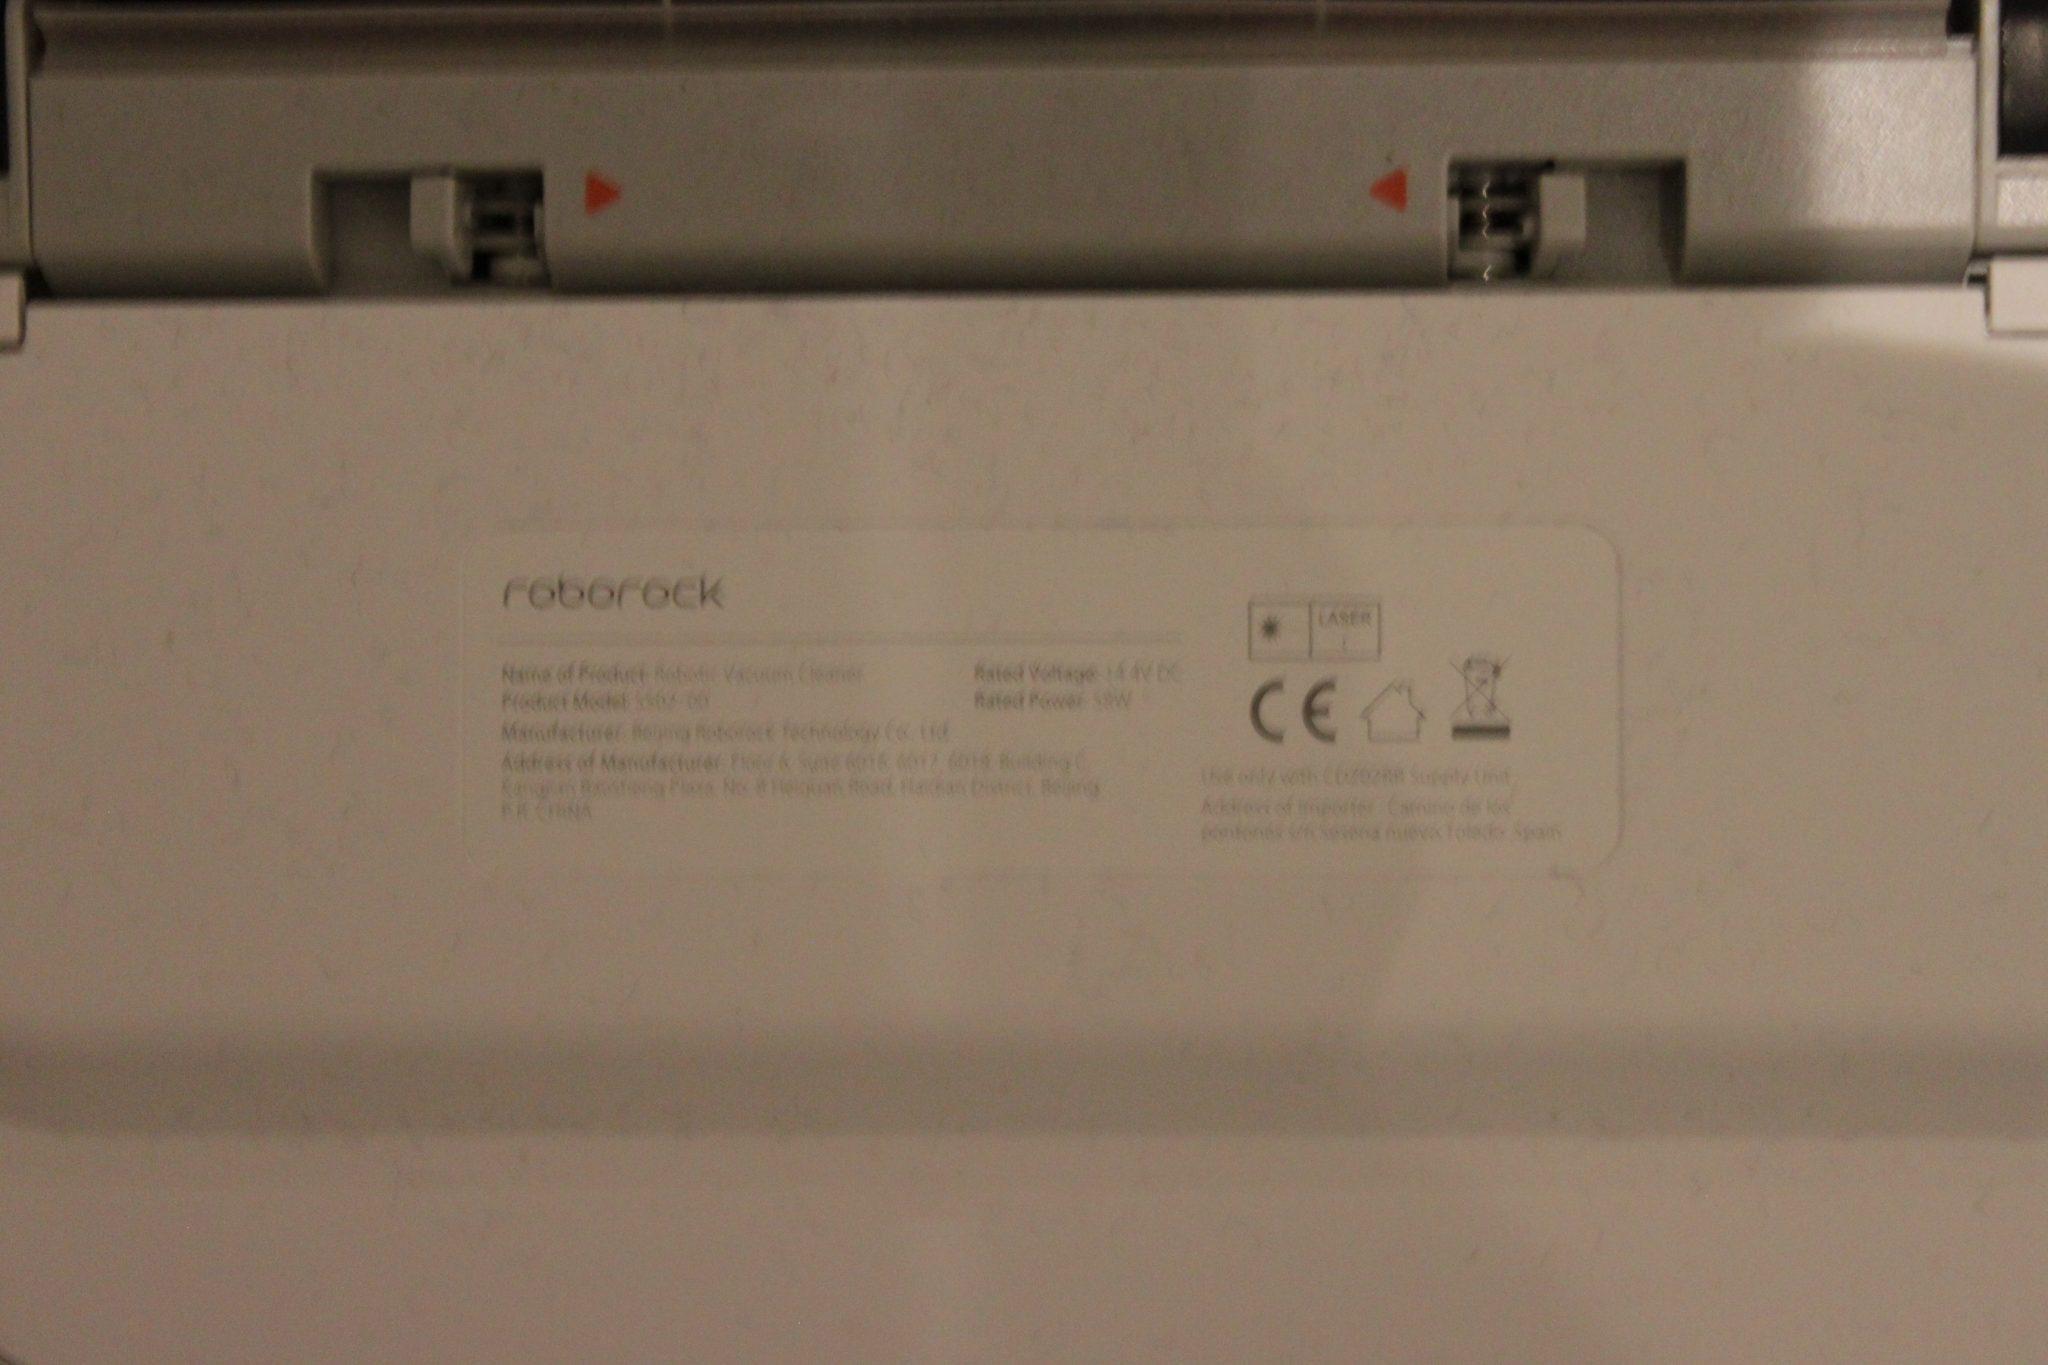 Roborock International CE